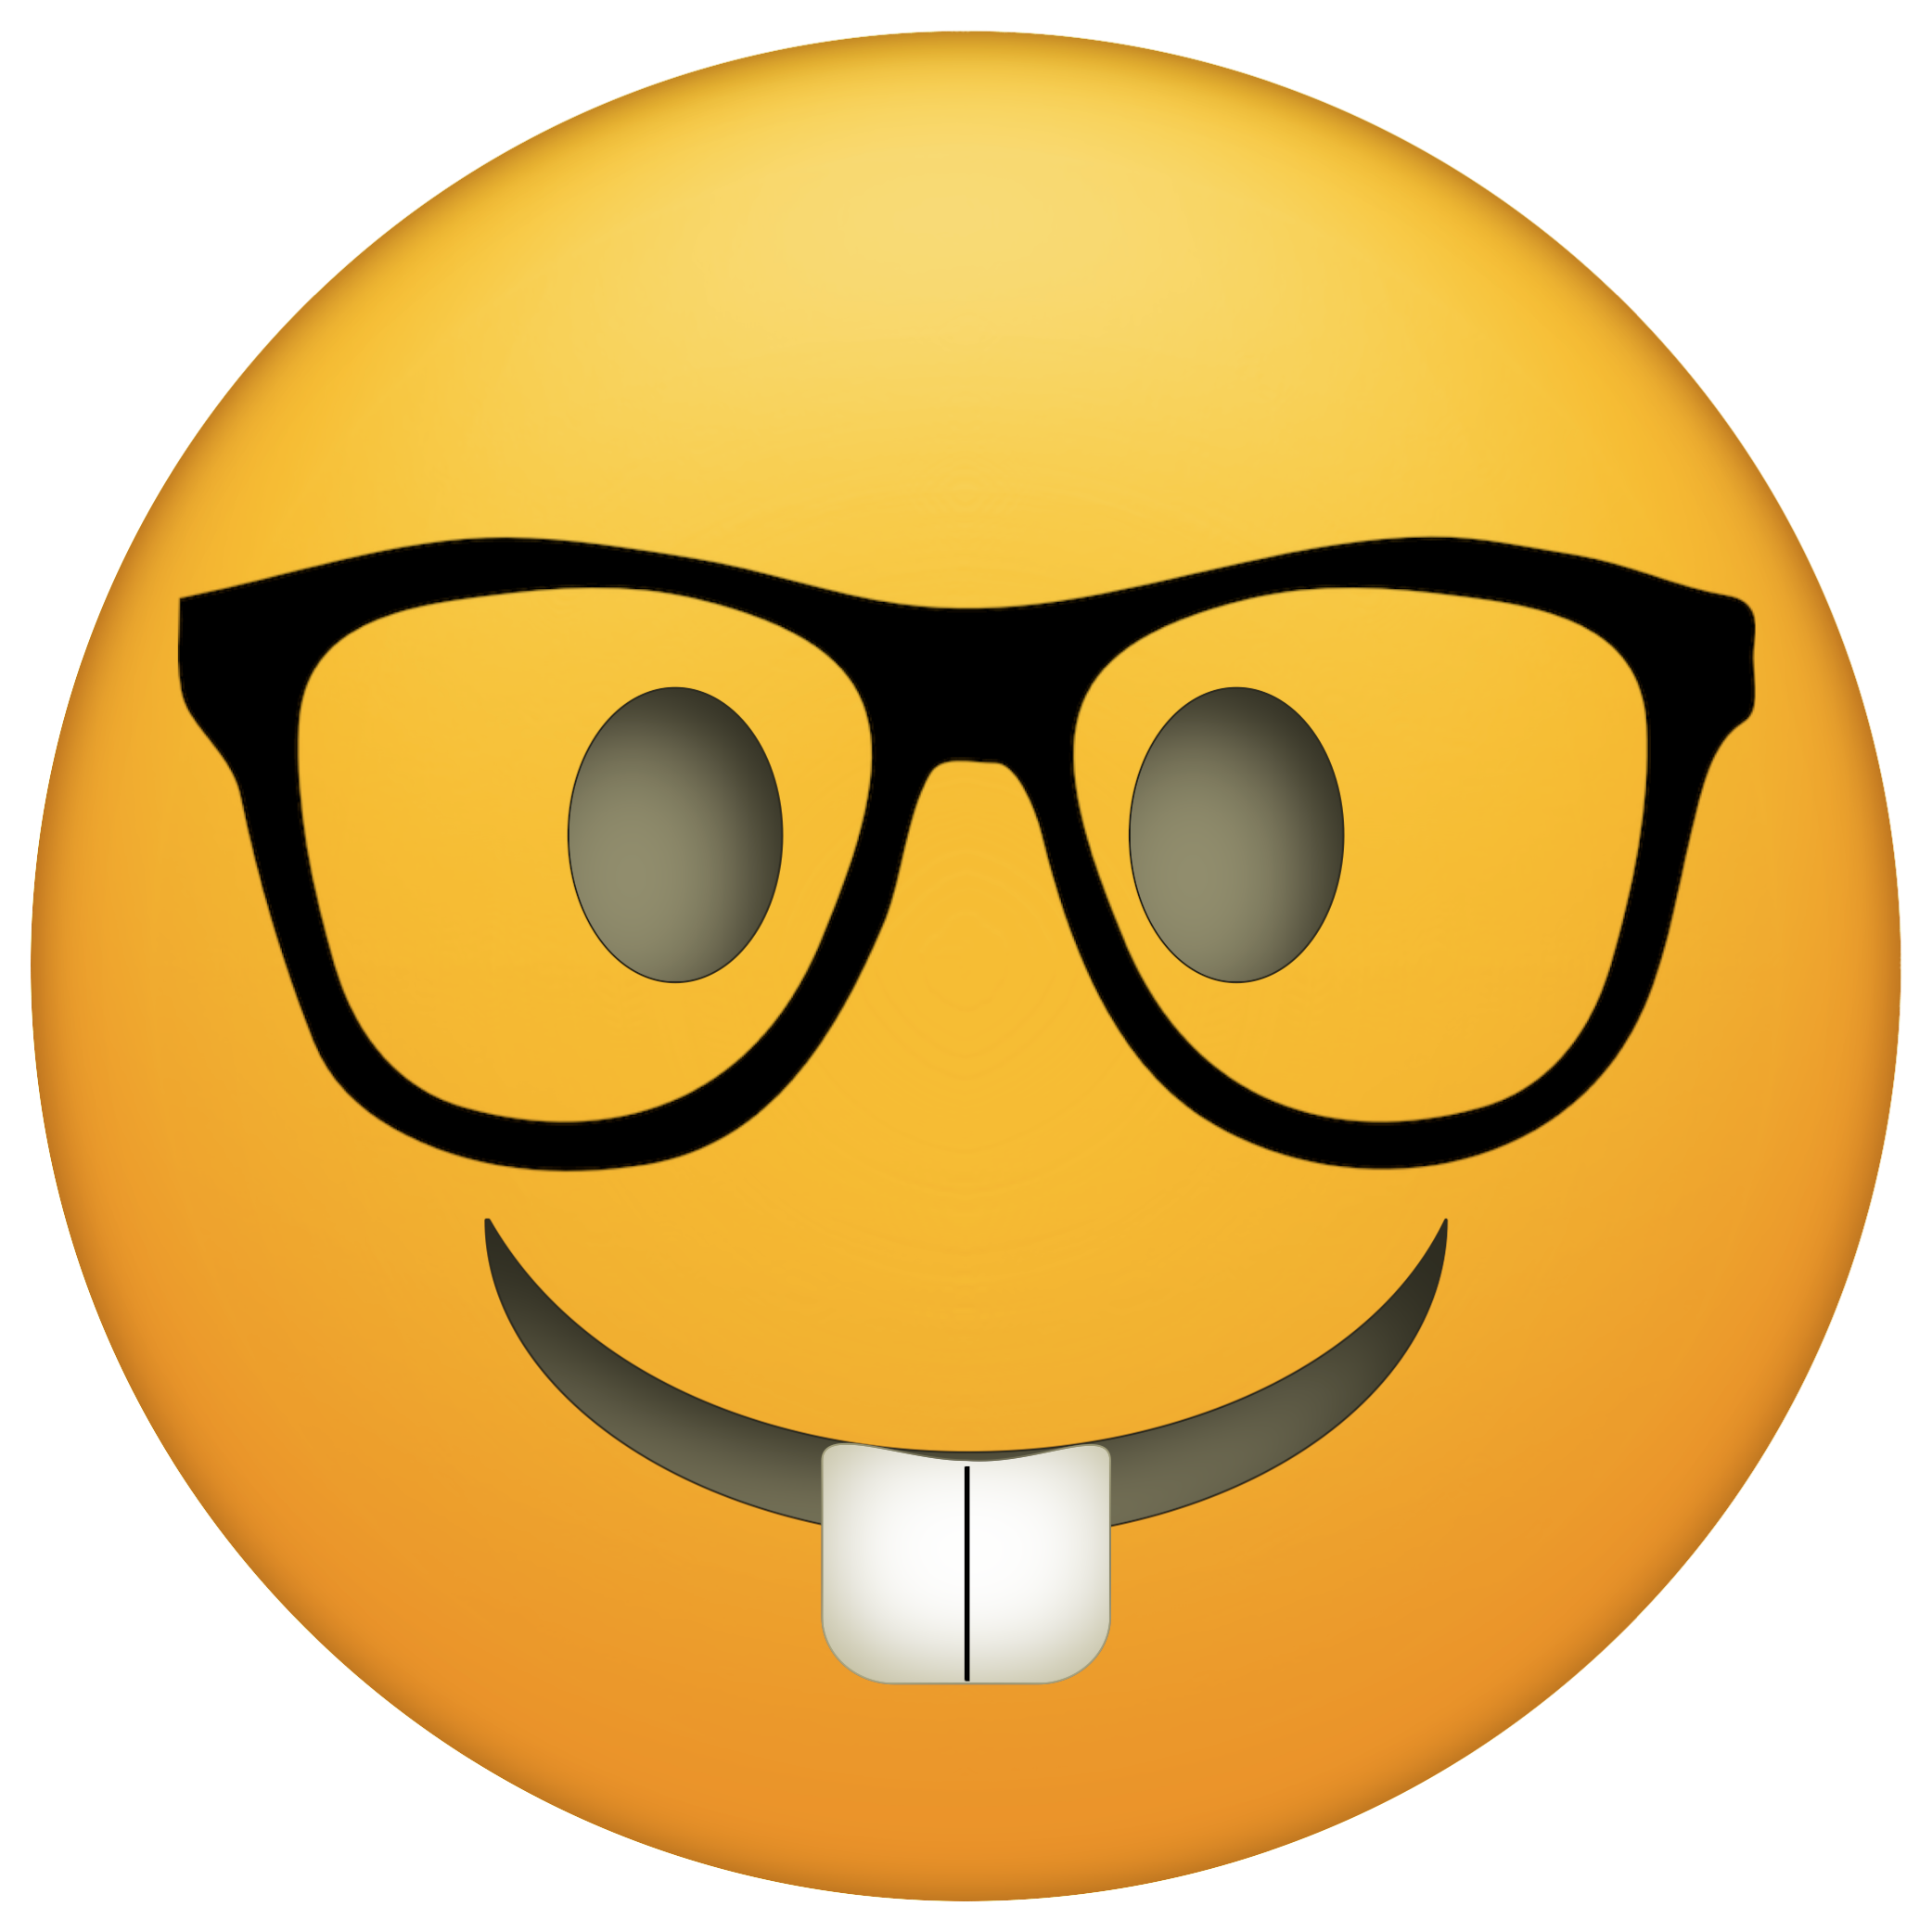 Pertraildesign Wp Content Uploads 06 Emoji